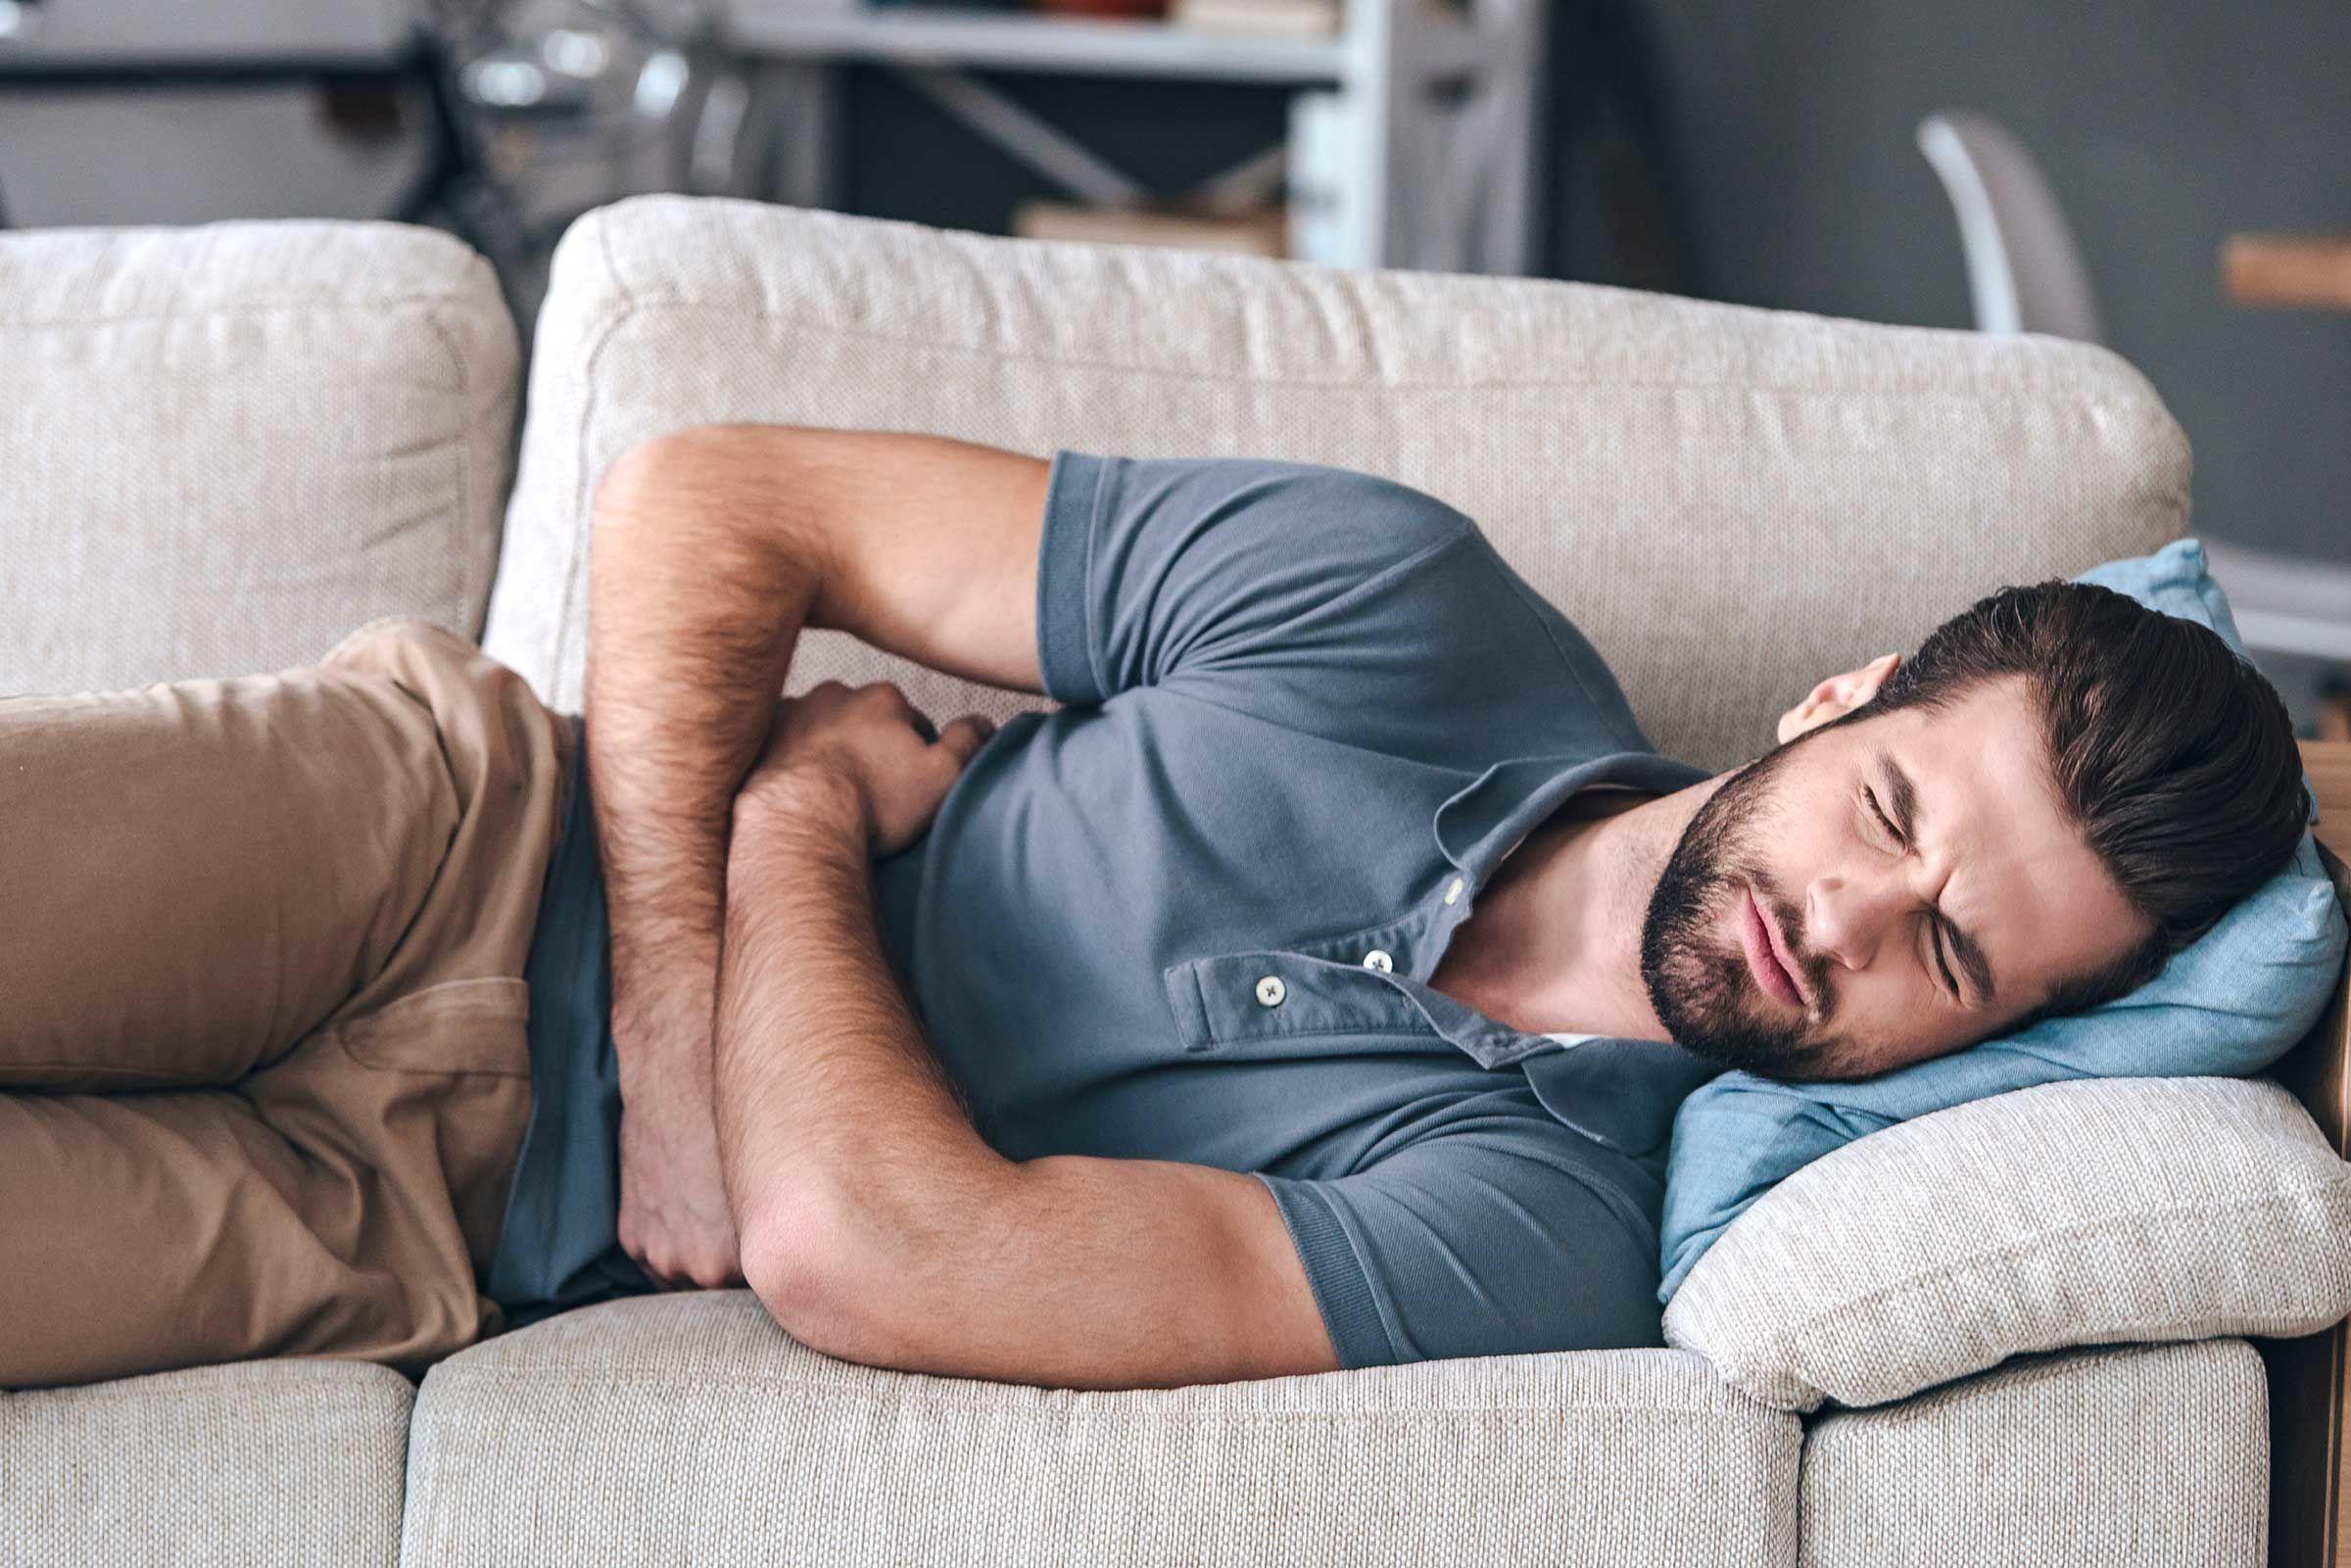 Hari Kopi, 12 Fakta Ilmiah Cara Kerja Kafein yang Bikin Susah Tidur